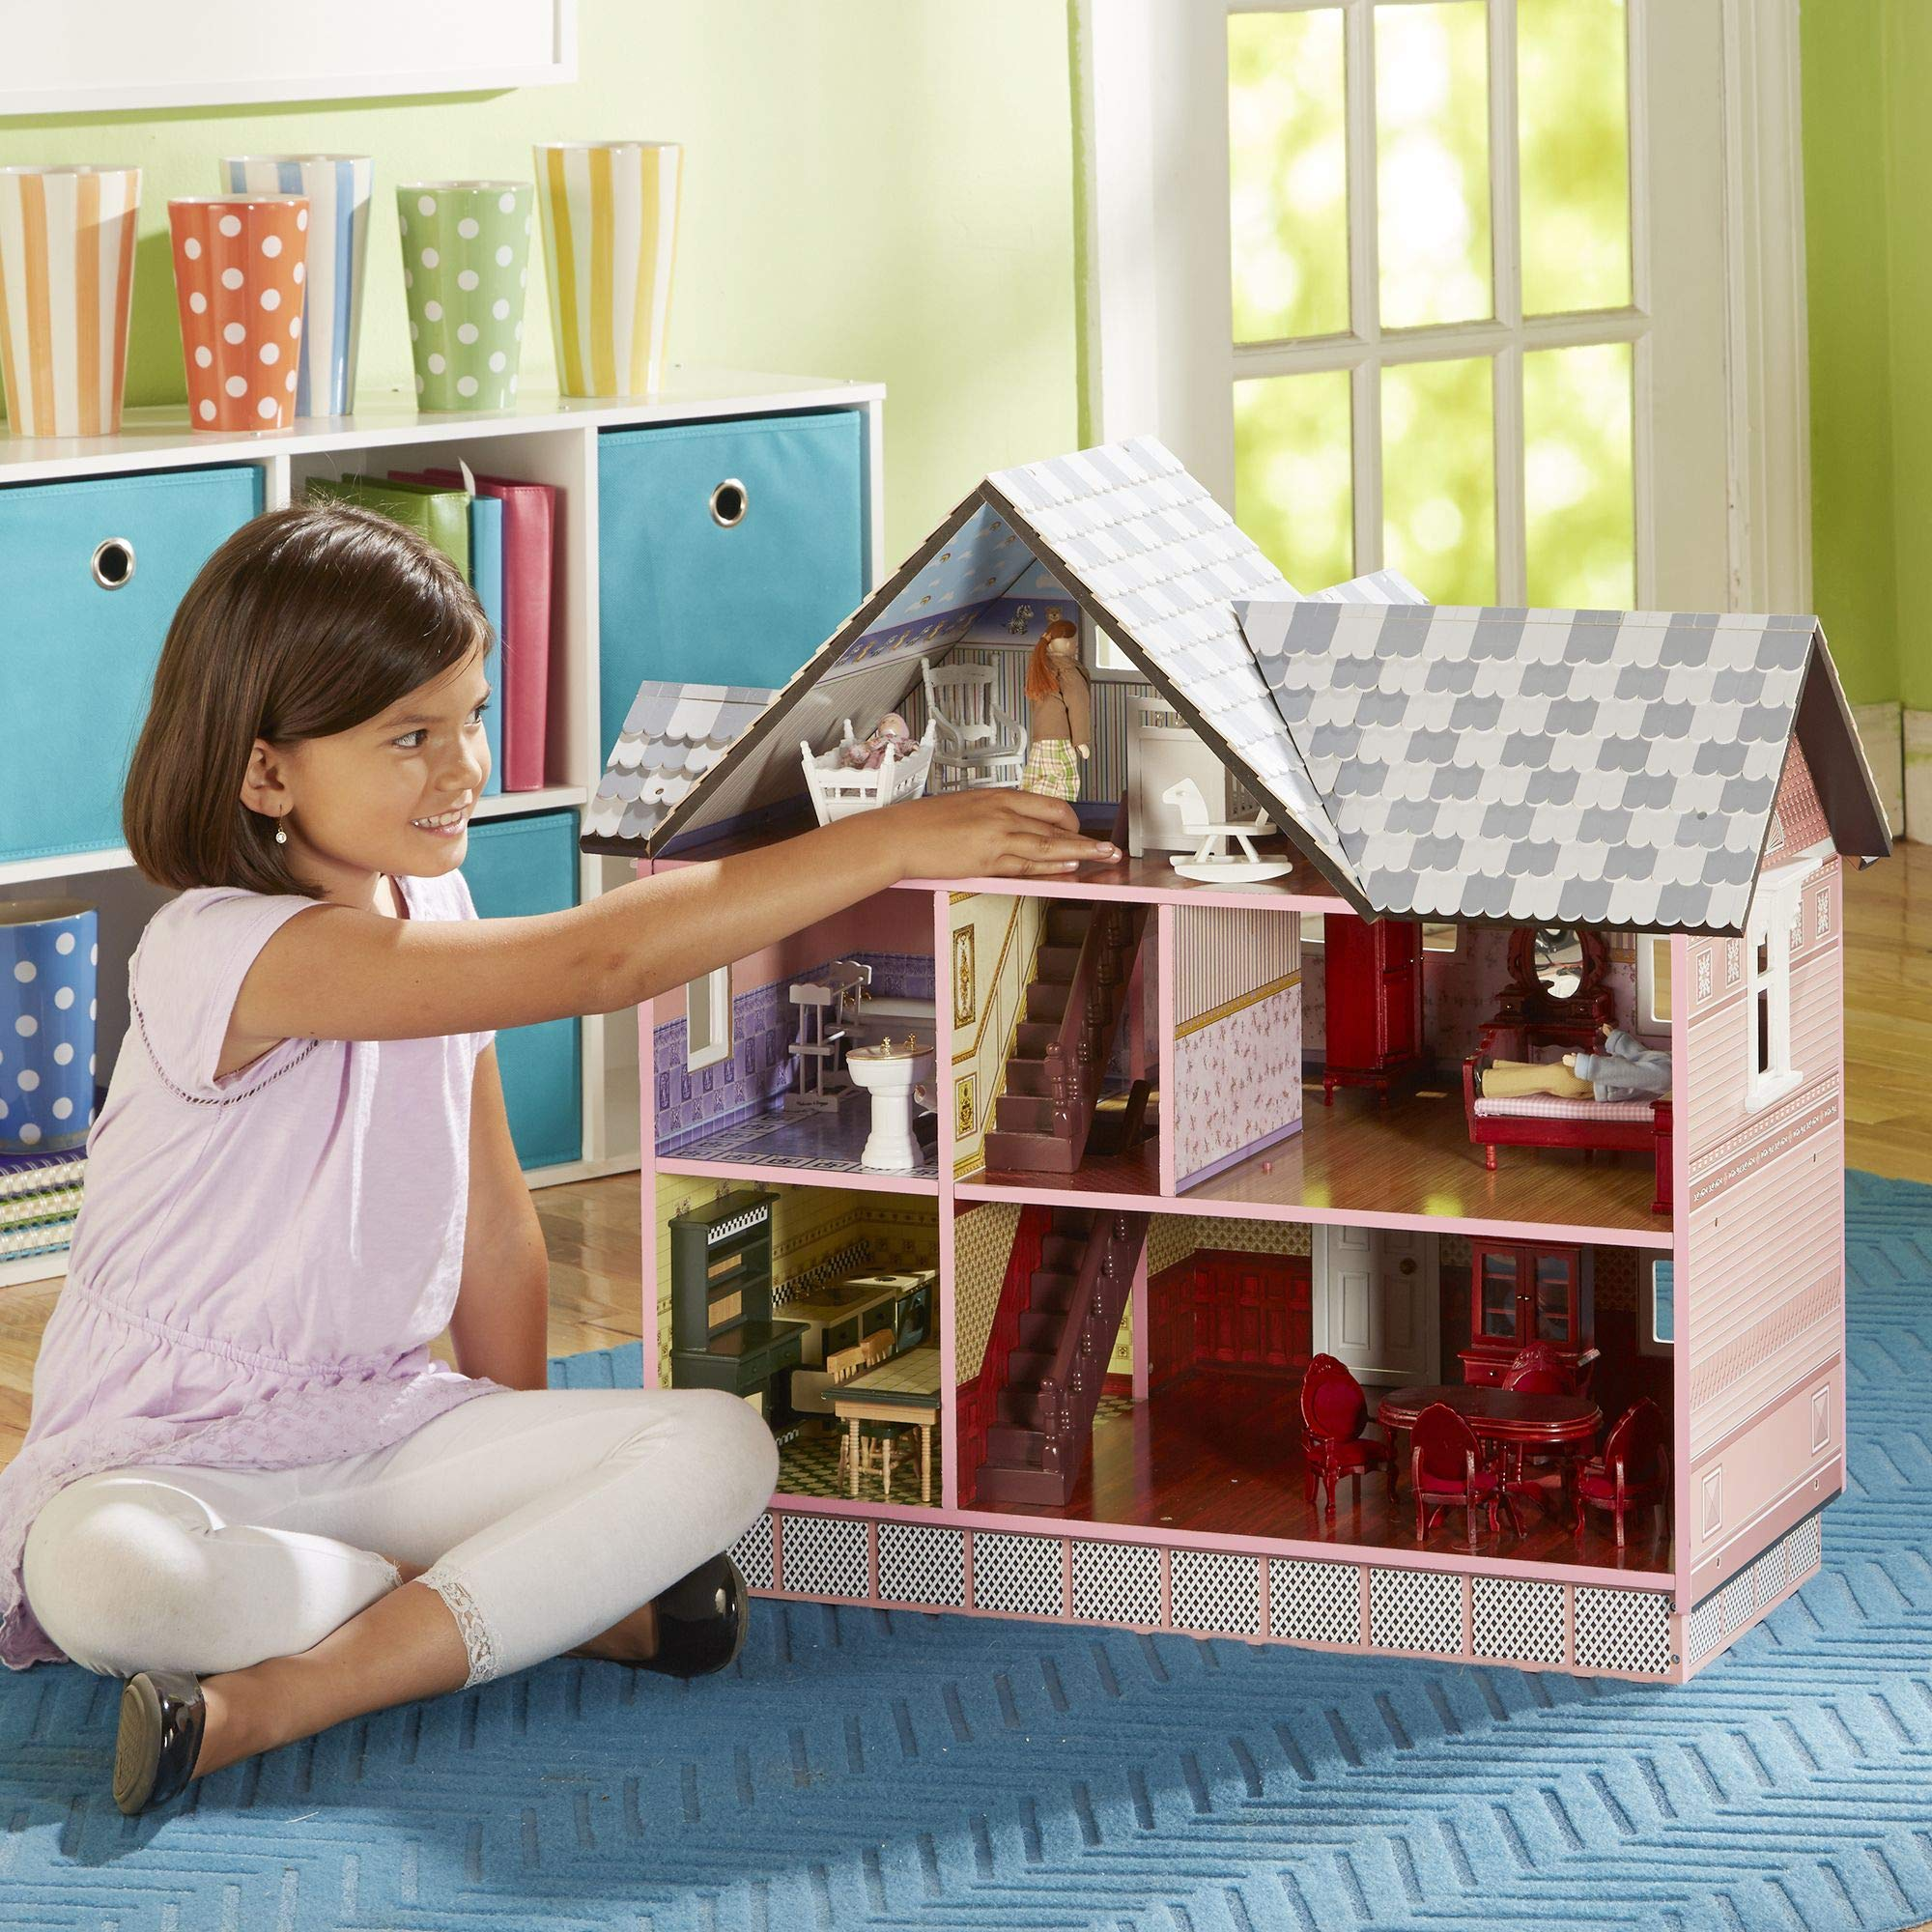 "Melissa & Doug Victorian Dollhouse (Dolls & Dollhouses, Detailed Illustrations, Sturdy Wooden Construction, 29.5"" H x 28"" W x 18"" L)"